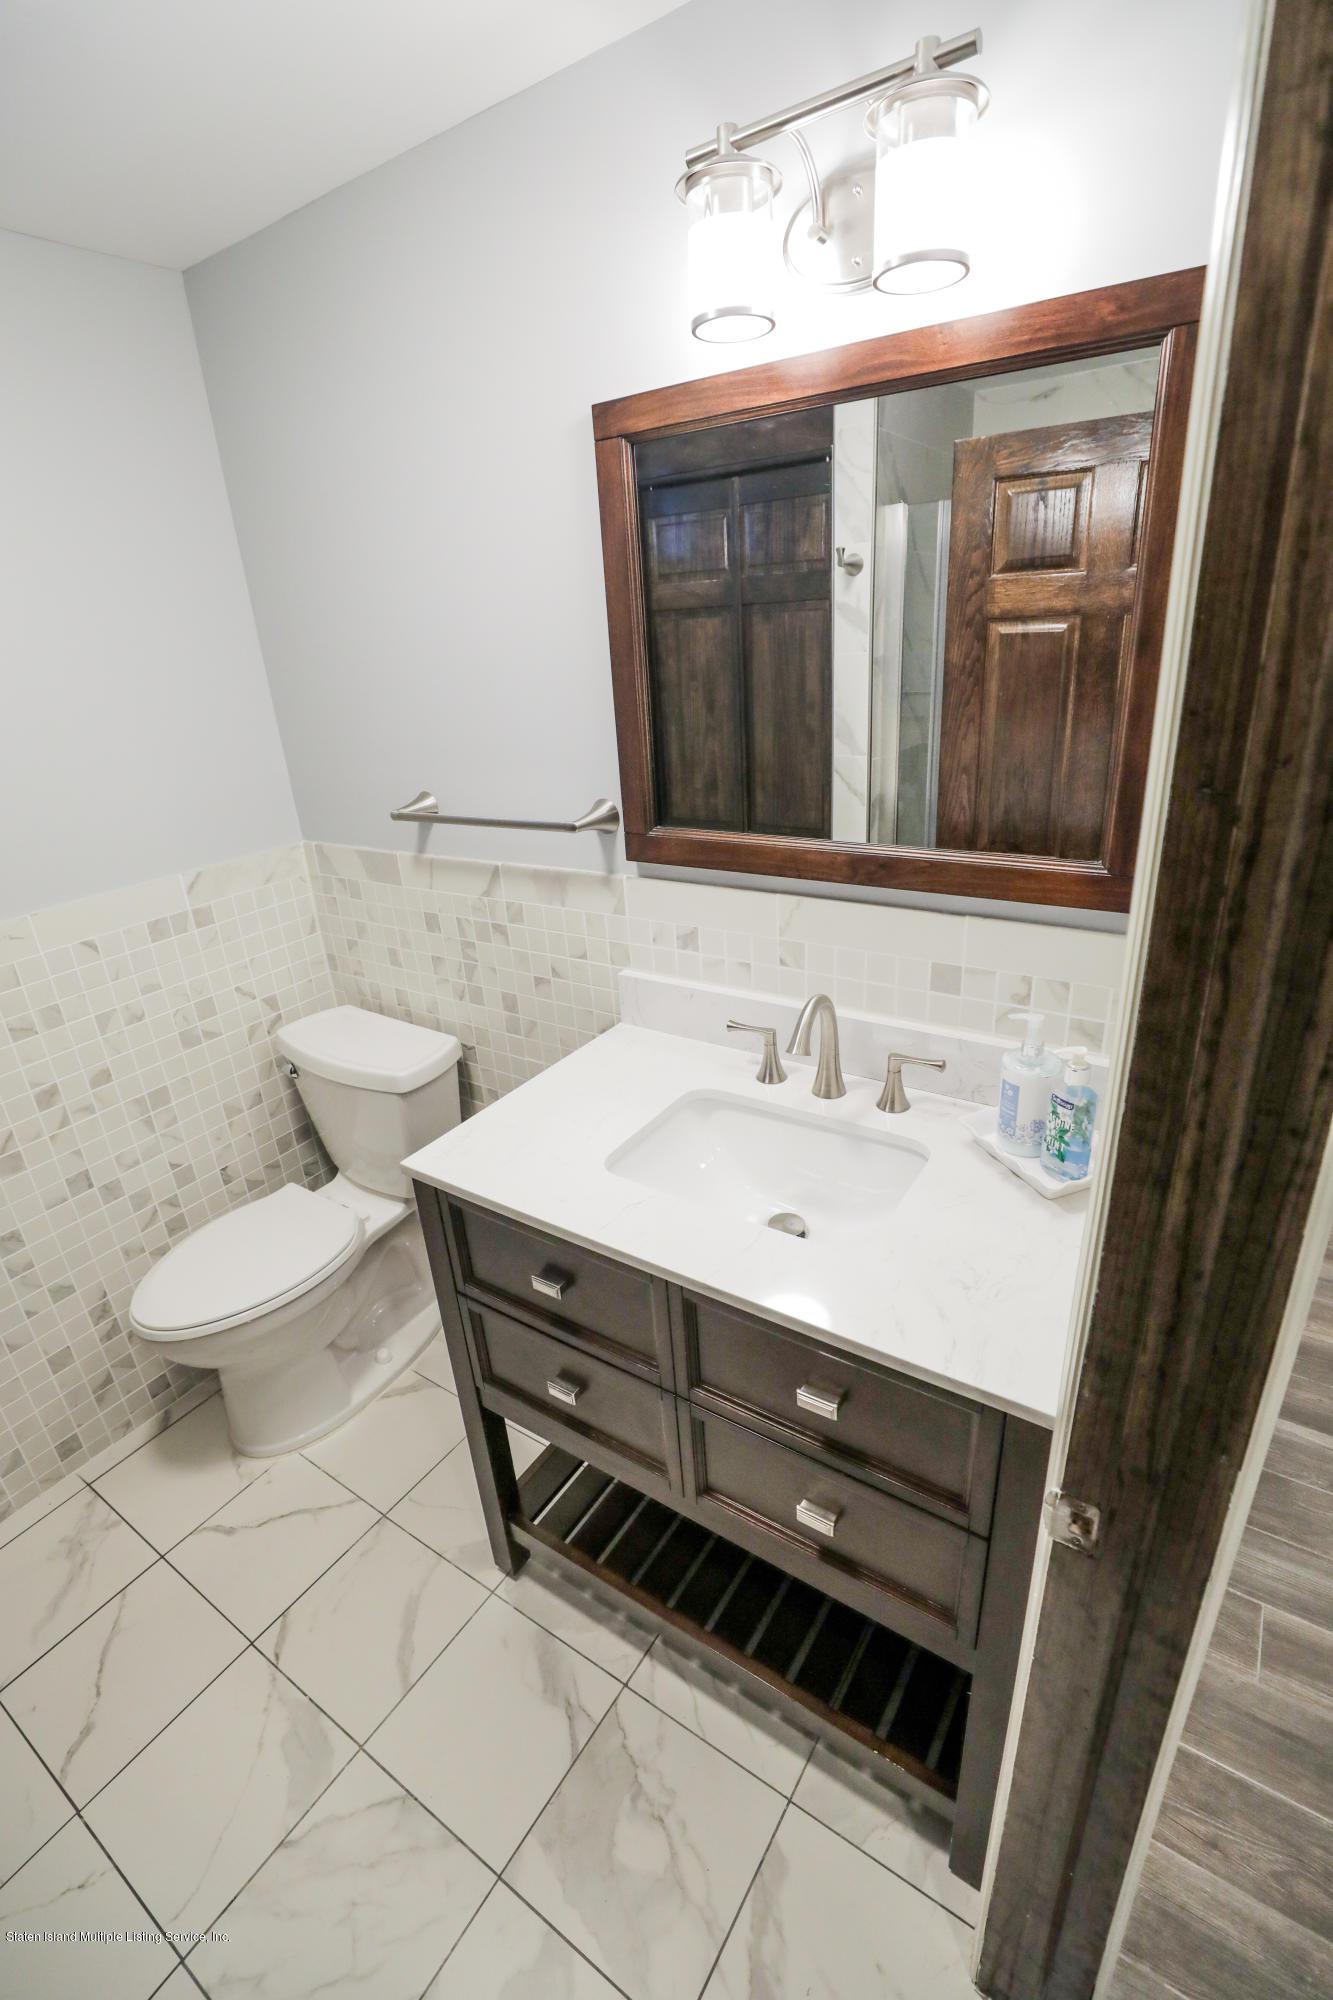 Single Family - Detached 151 Noel St   Staten Island, NY 10312, MLS-1131068-27